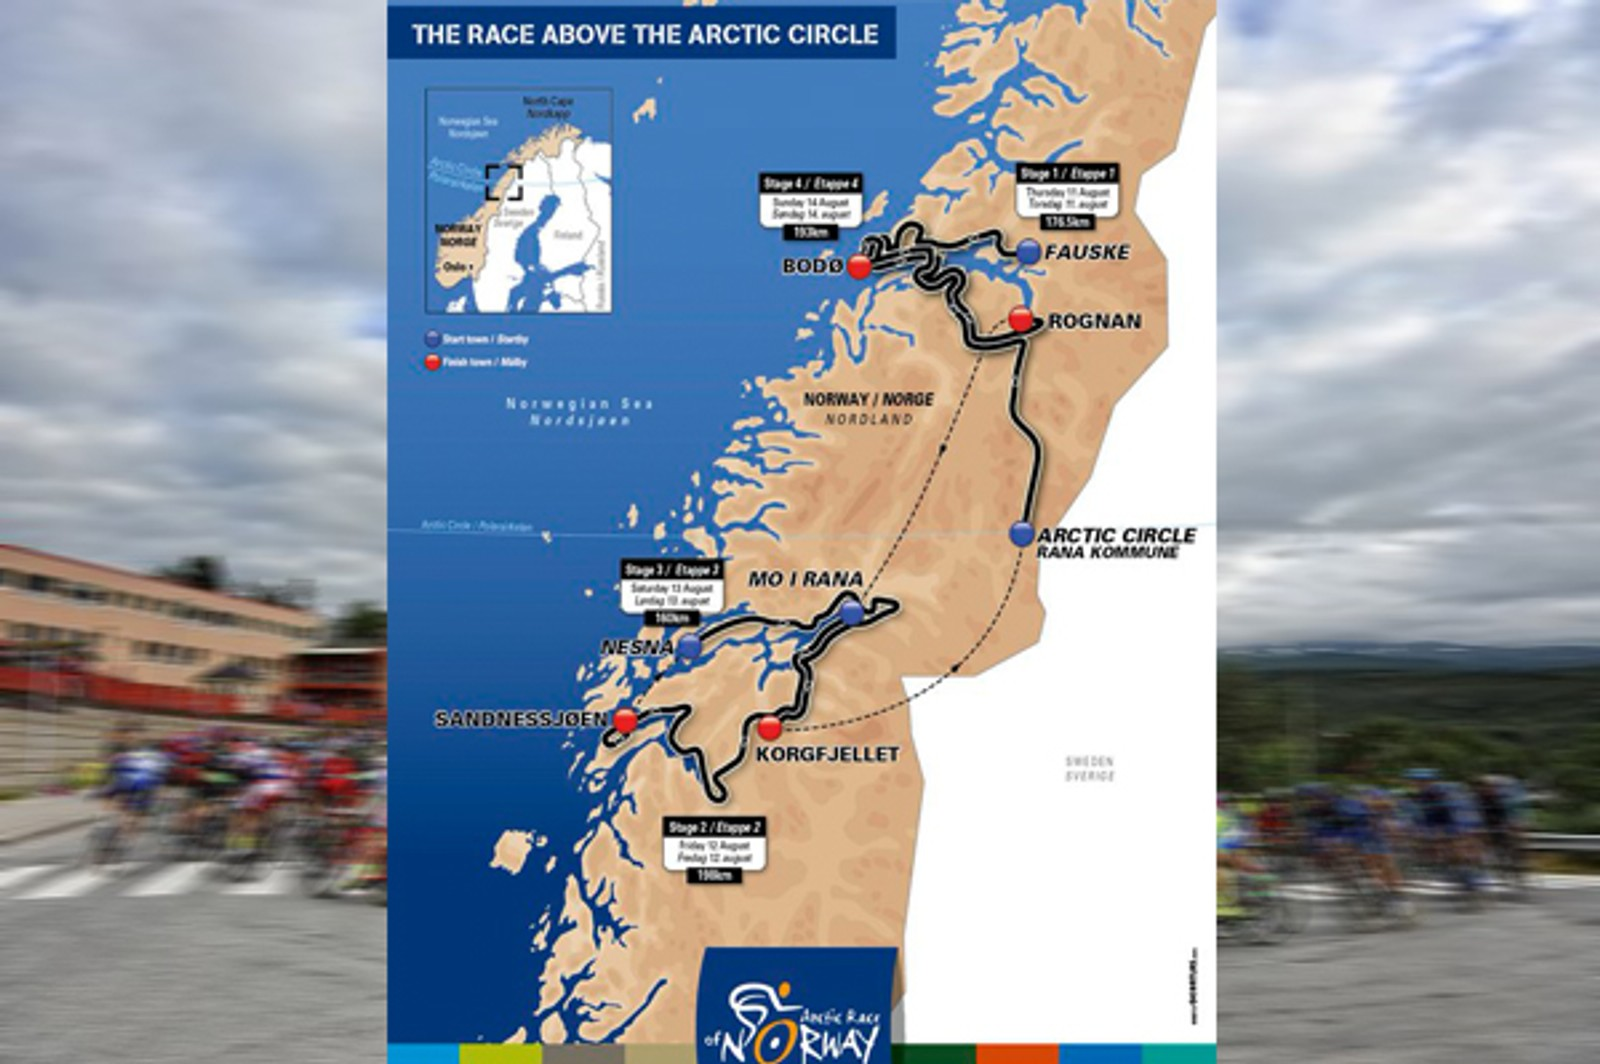 Årets Arctic Race skal innom 12 kommuner, hvorav ni kommuner på Helgeland.